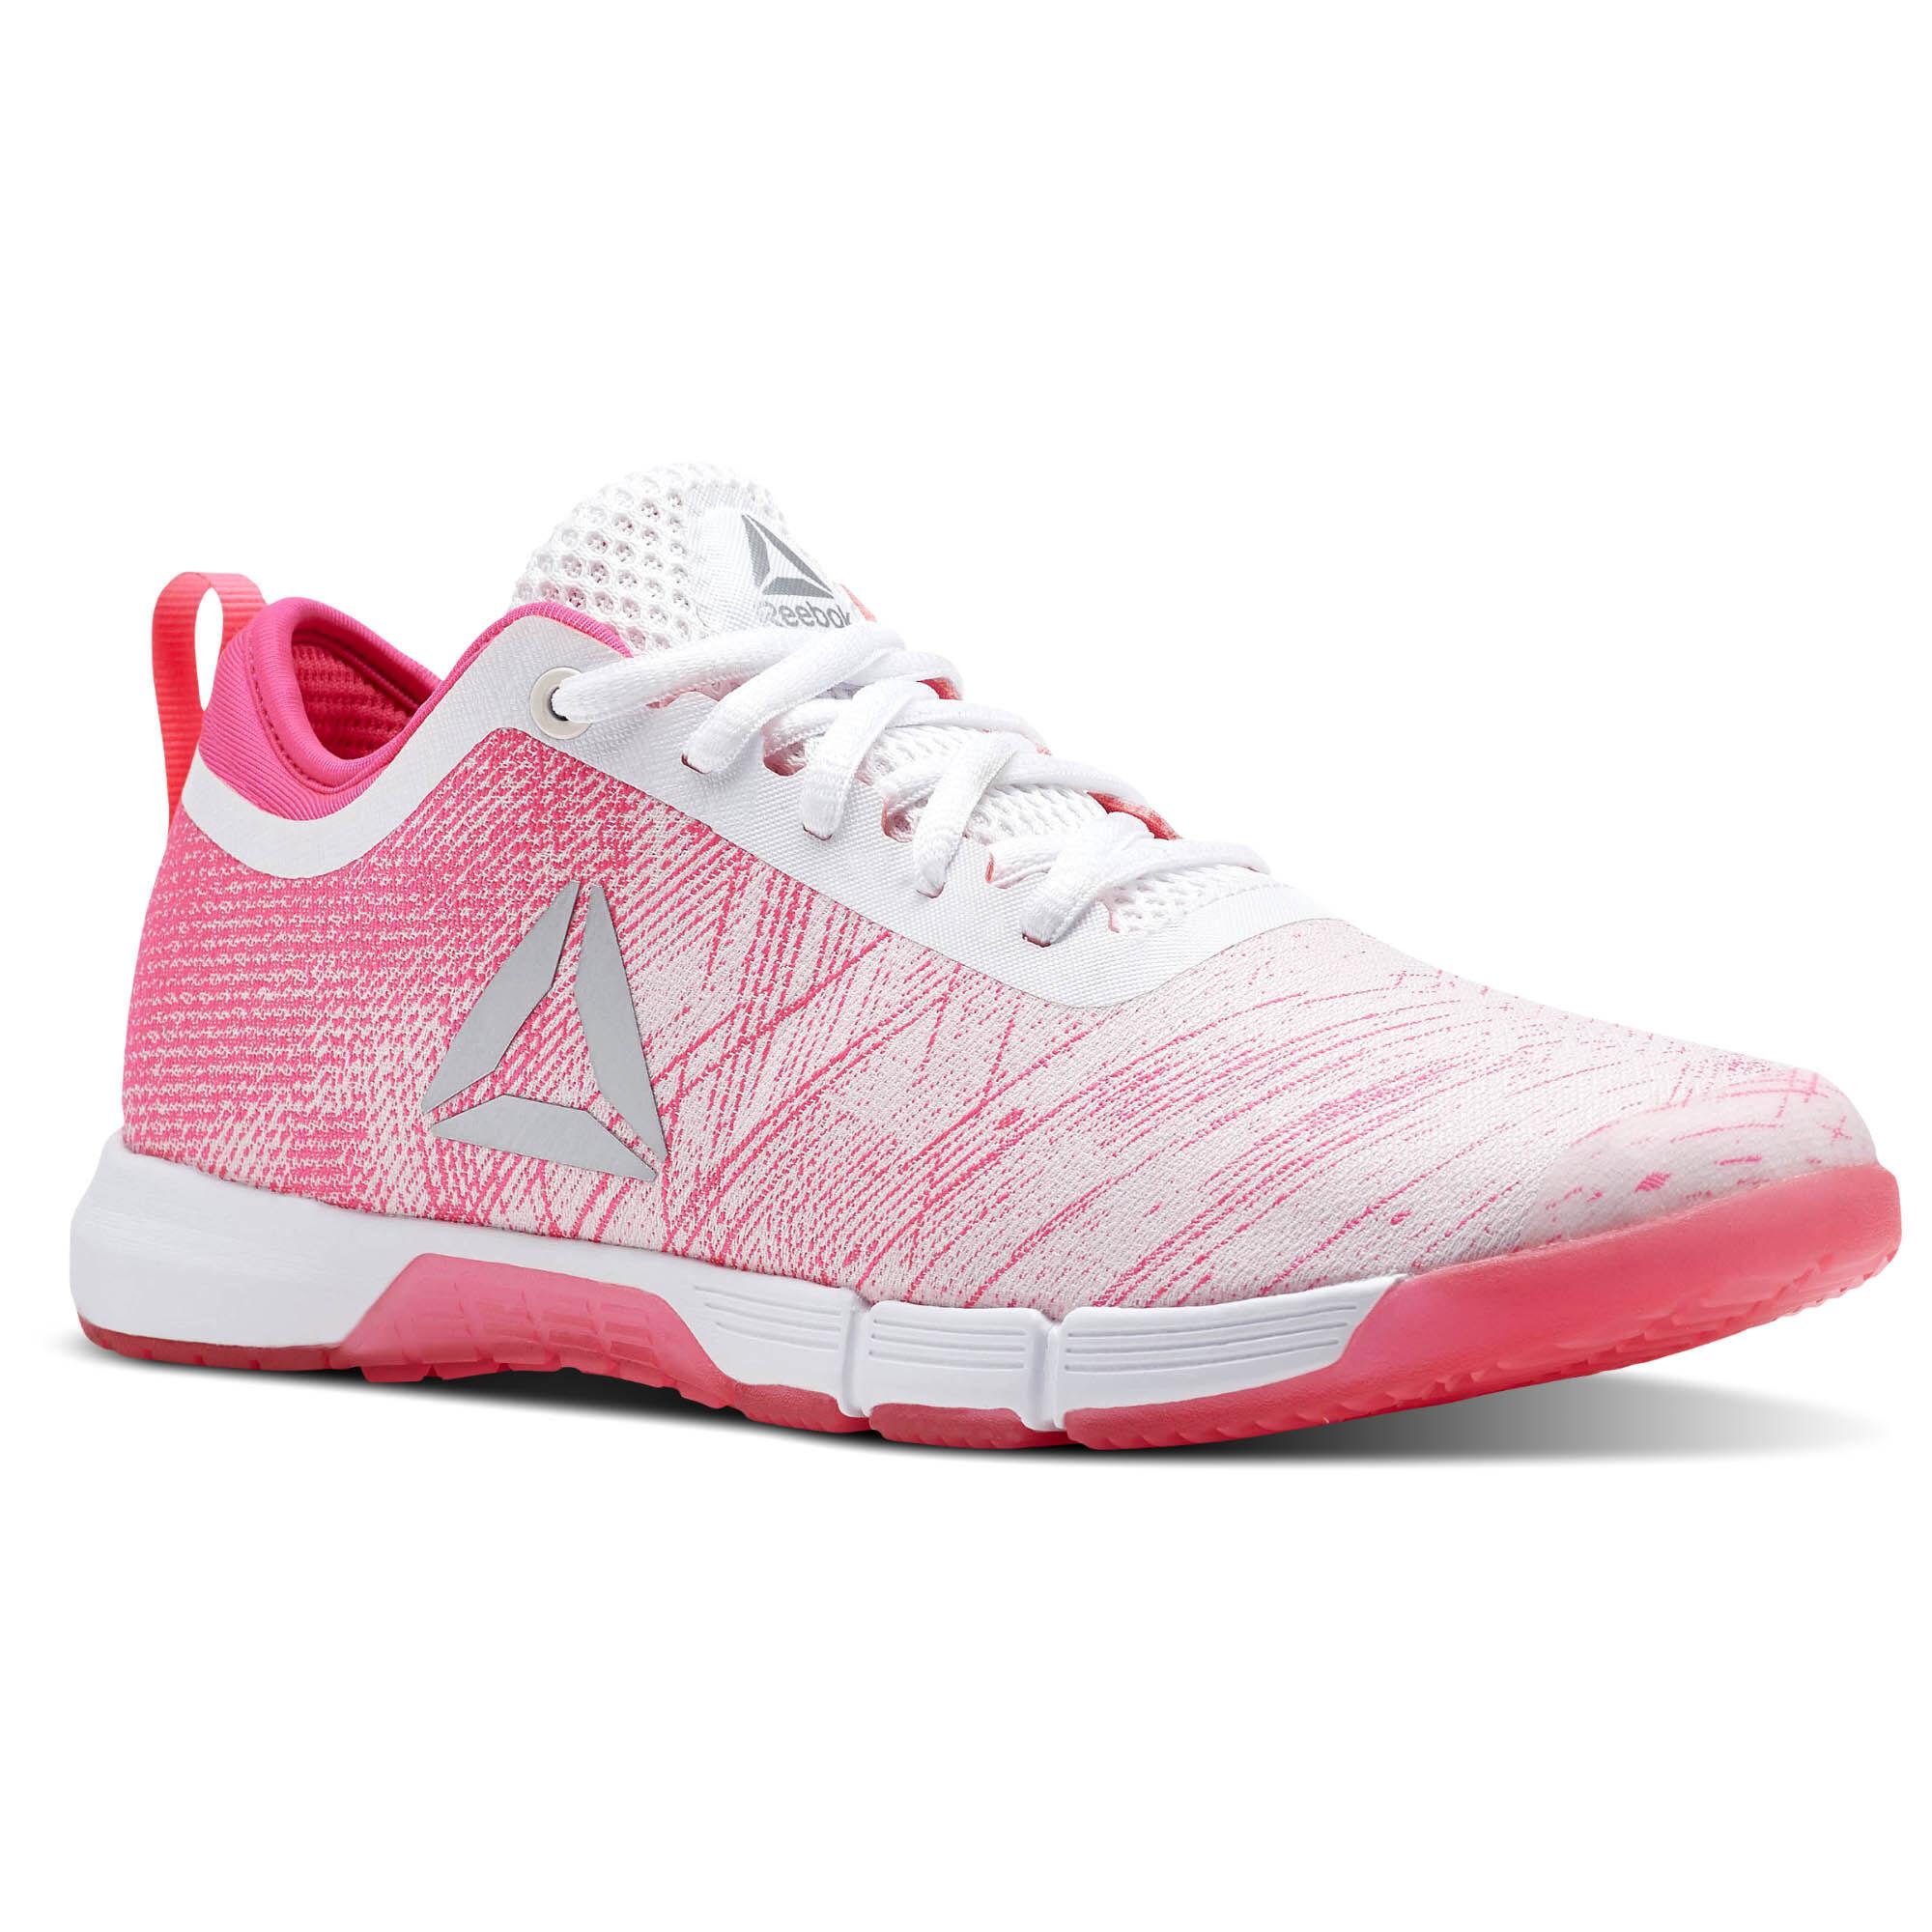 Schuhe Reebok - Speed Her Tr CN2246 Pink/White/Silver NxZVx